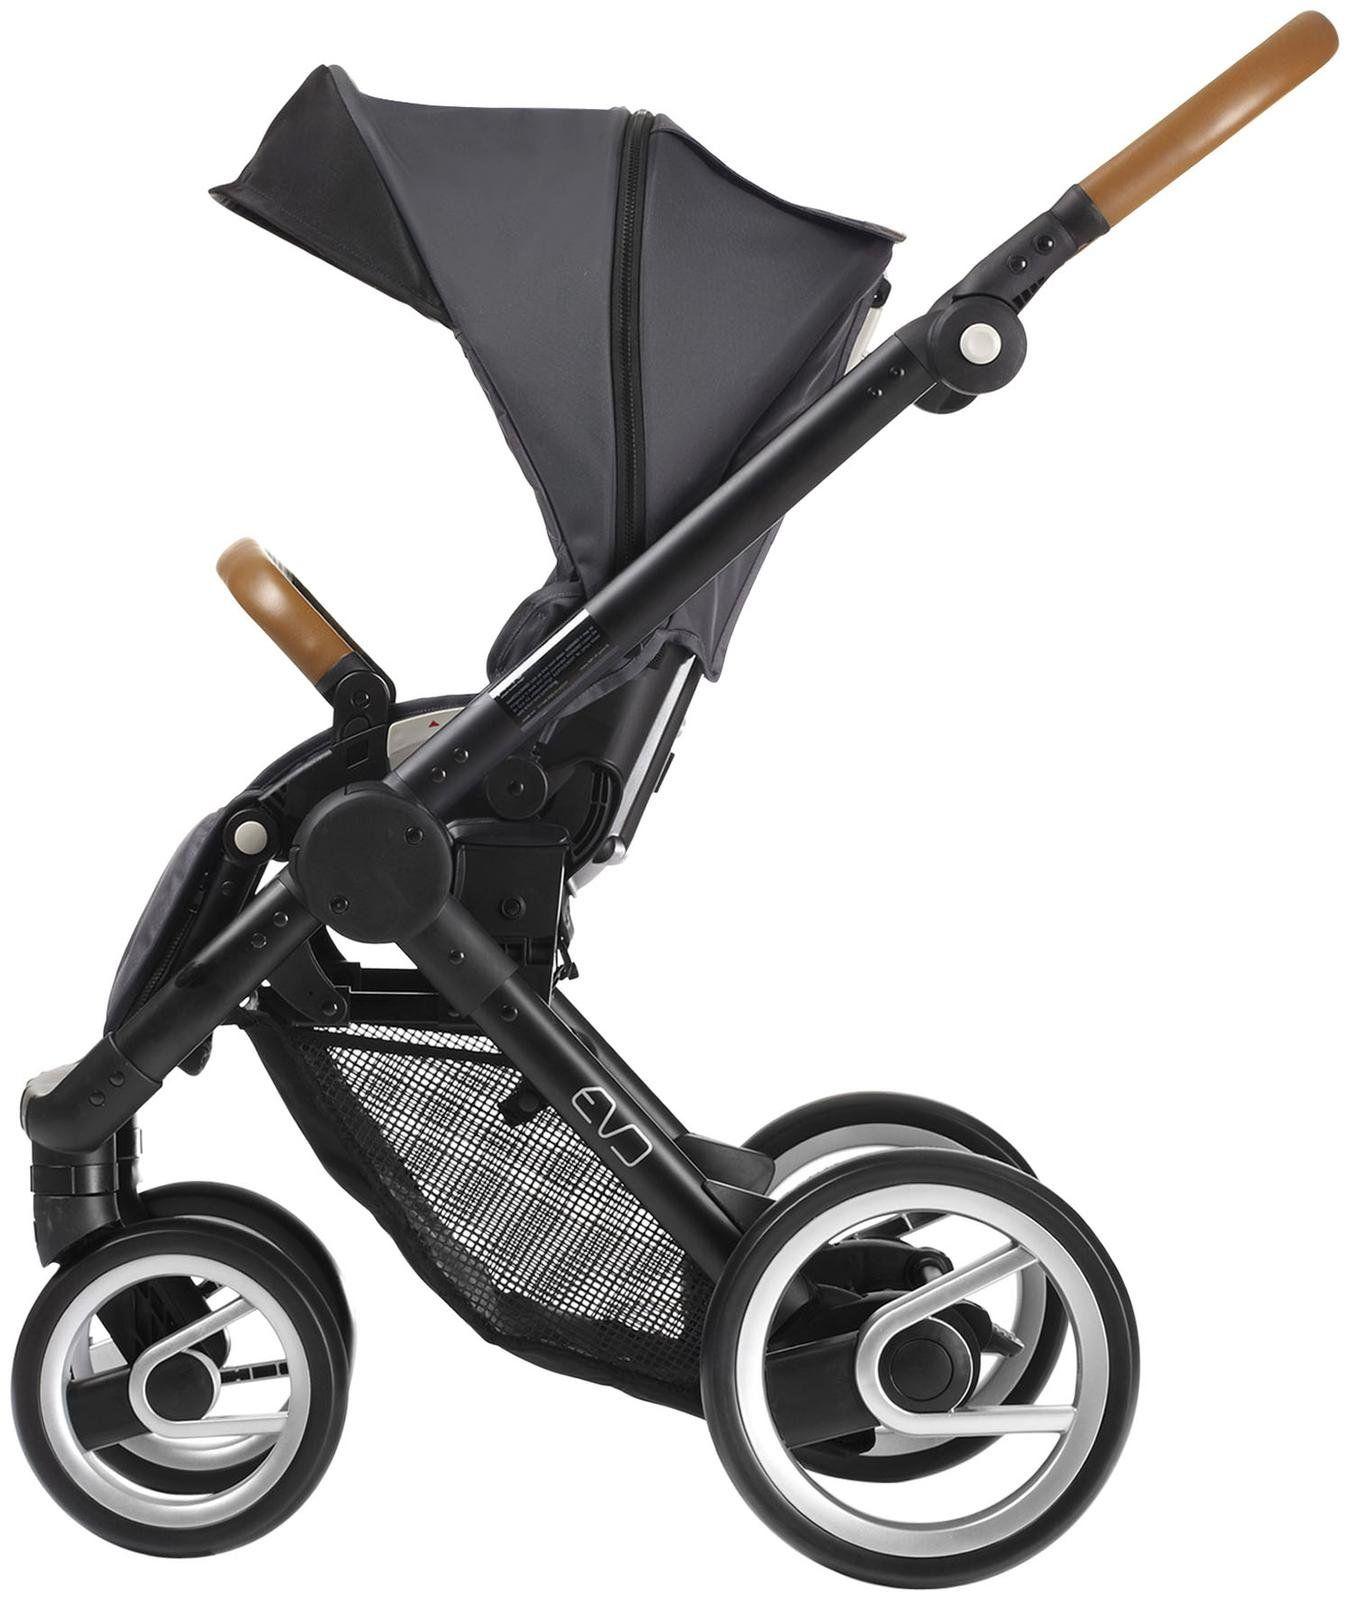 Caroline's Cart A Shopping Solution for Special Needs